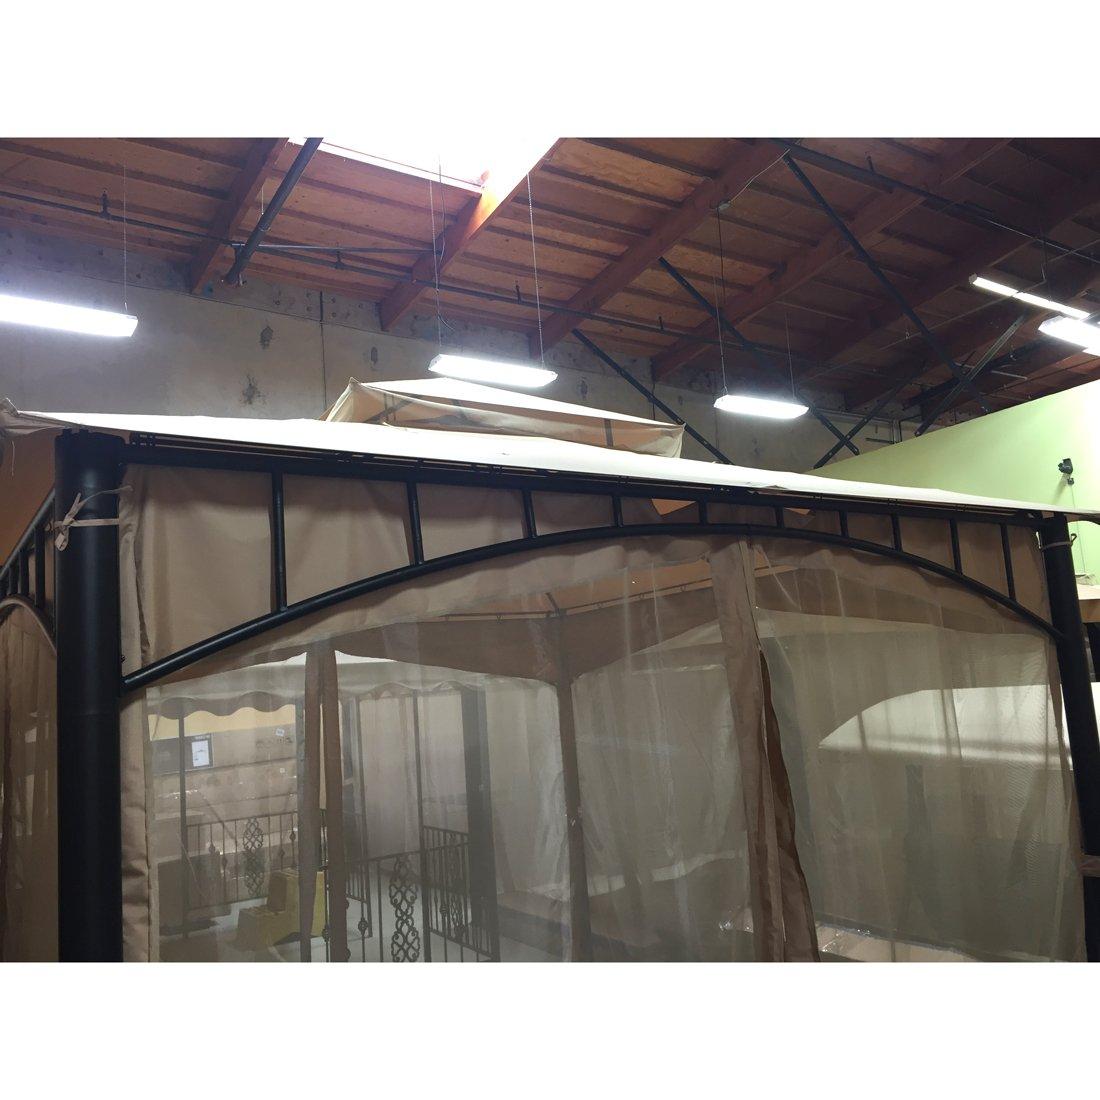 Garden Winds Replacement Canopy for The Gardena Gazebo - 350